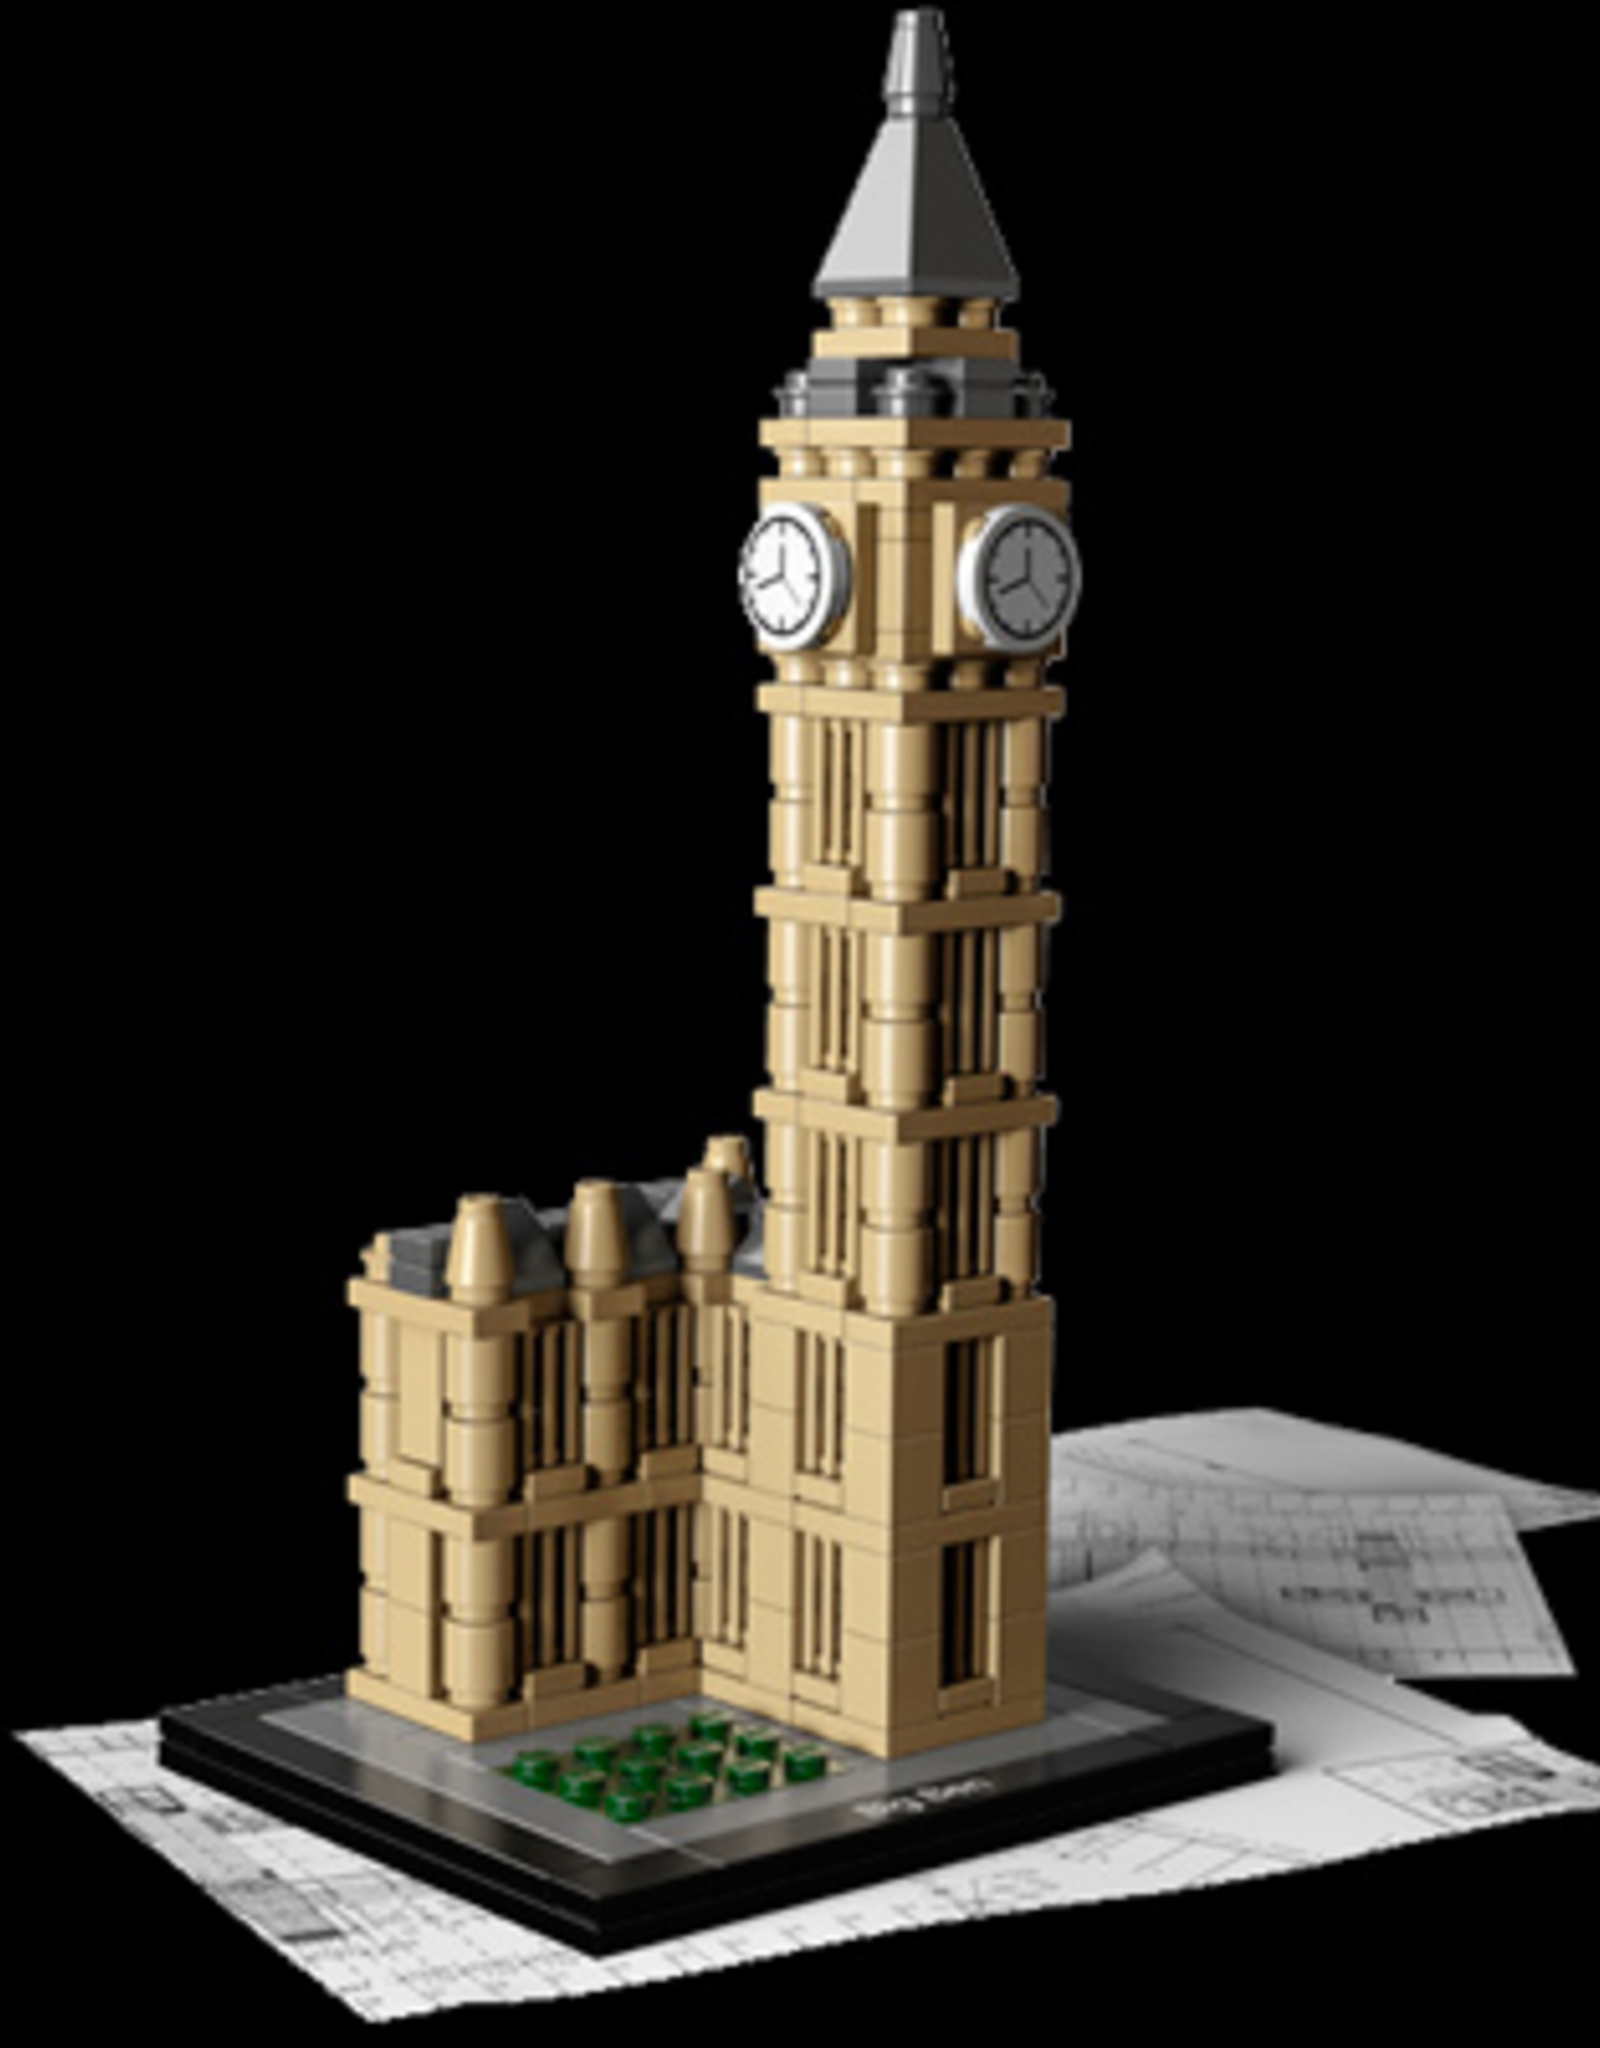 LEGO LEGO 21013 Big Ben - Architecture - SPECIALS